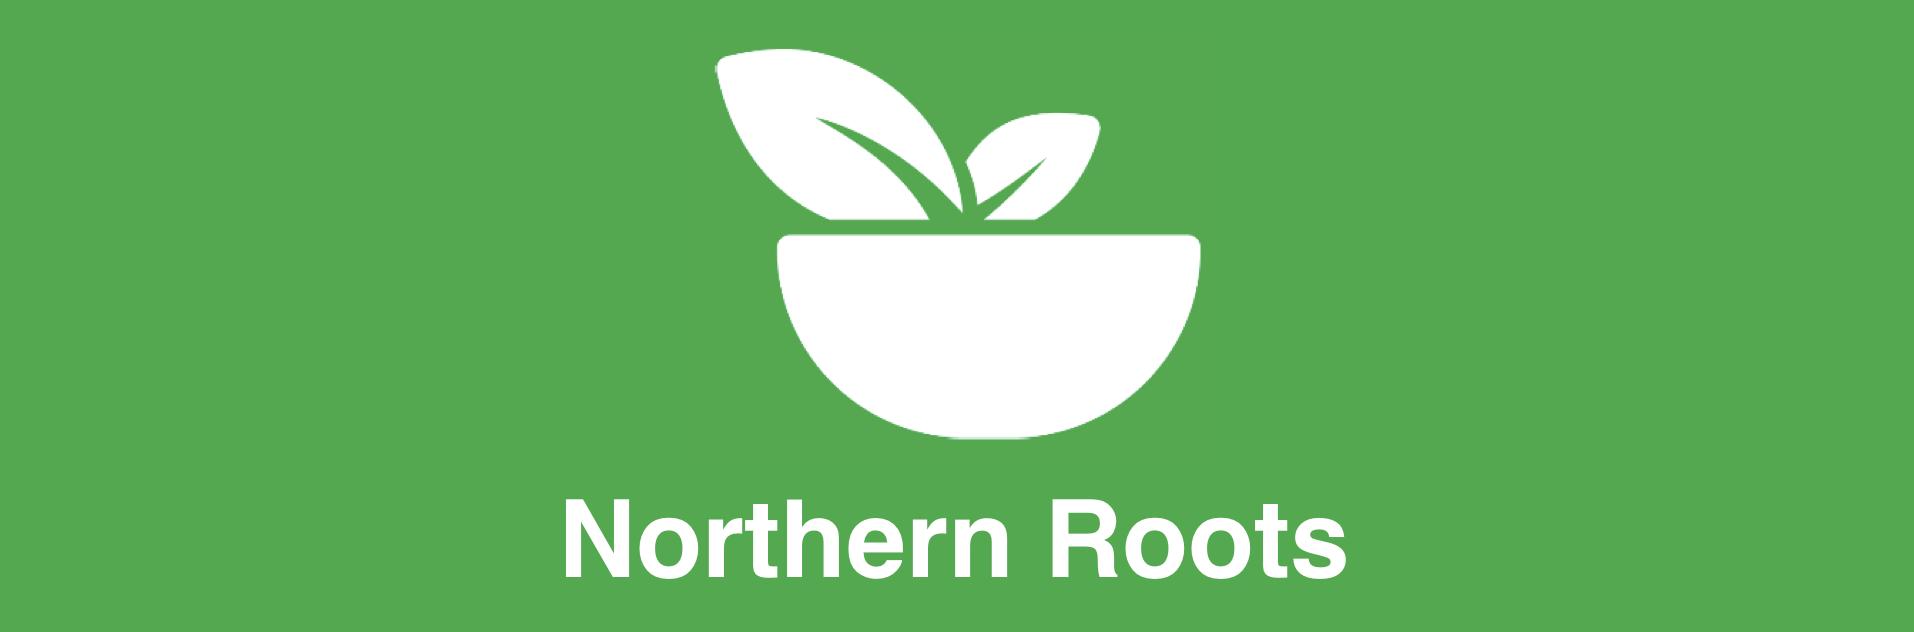 northernrootslogo.001.png